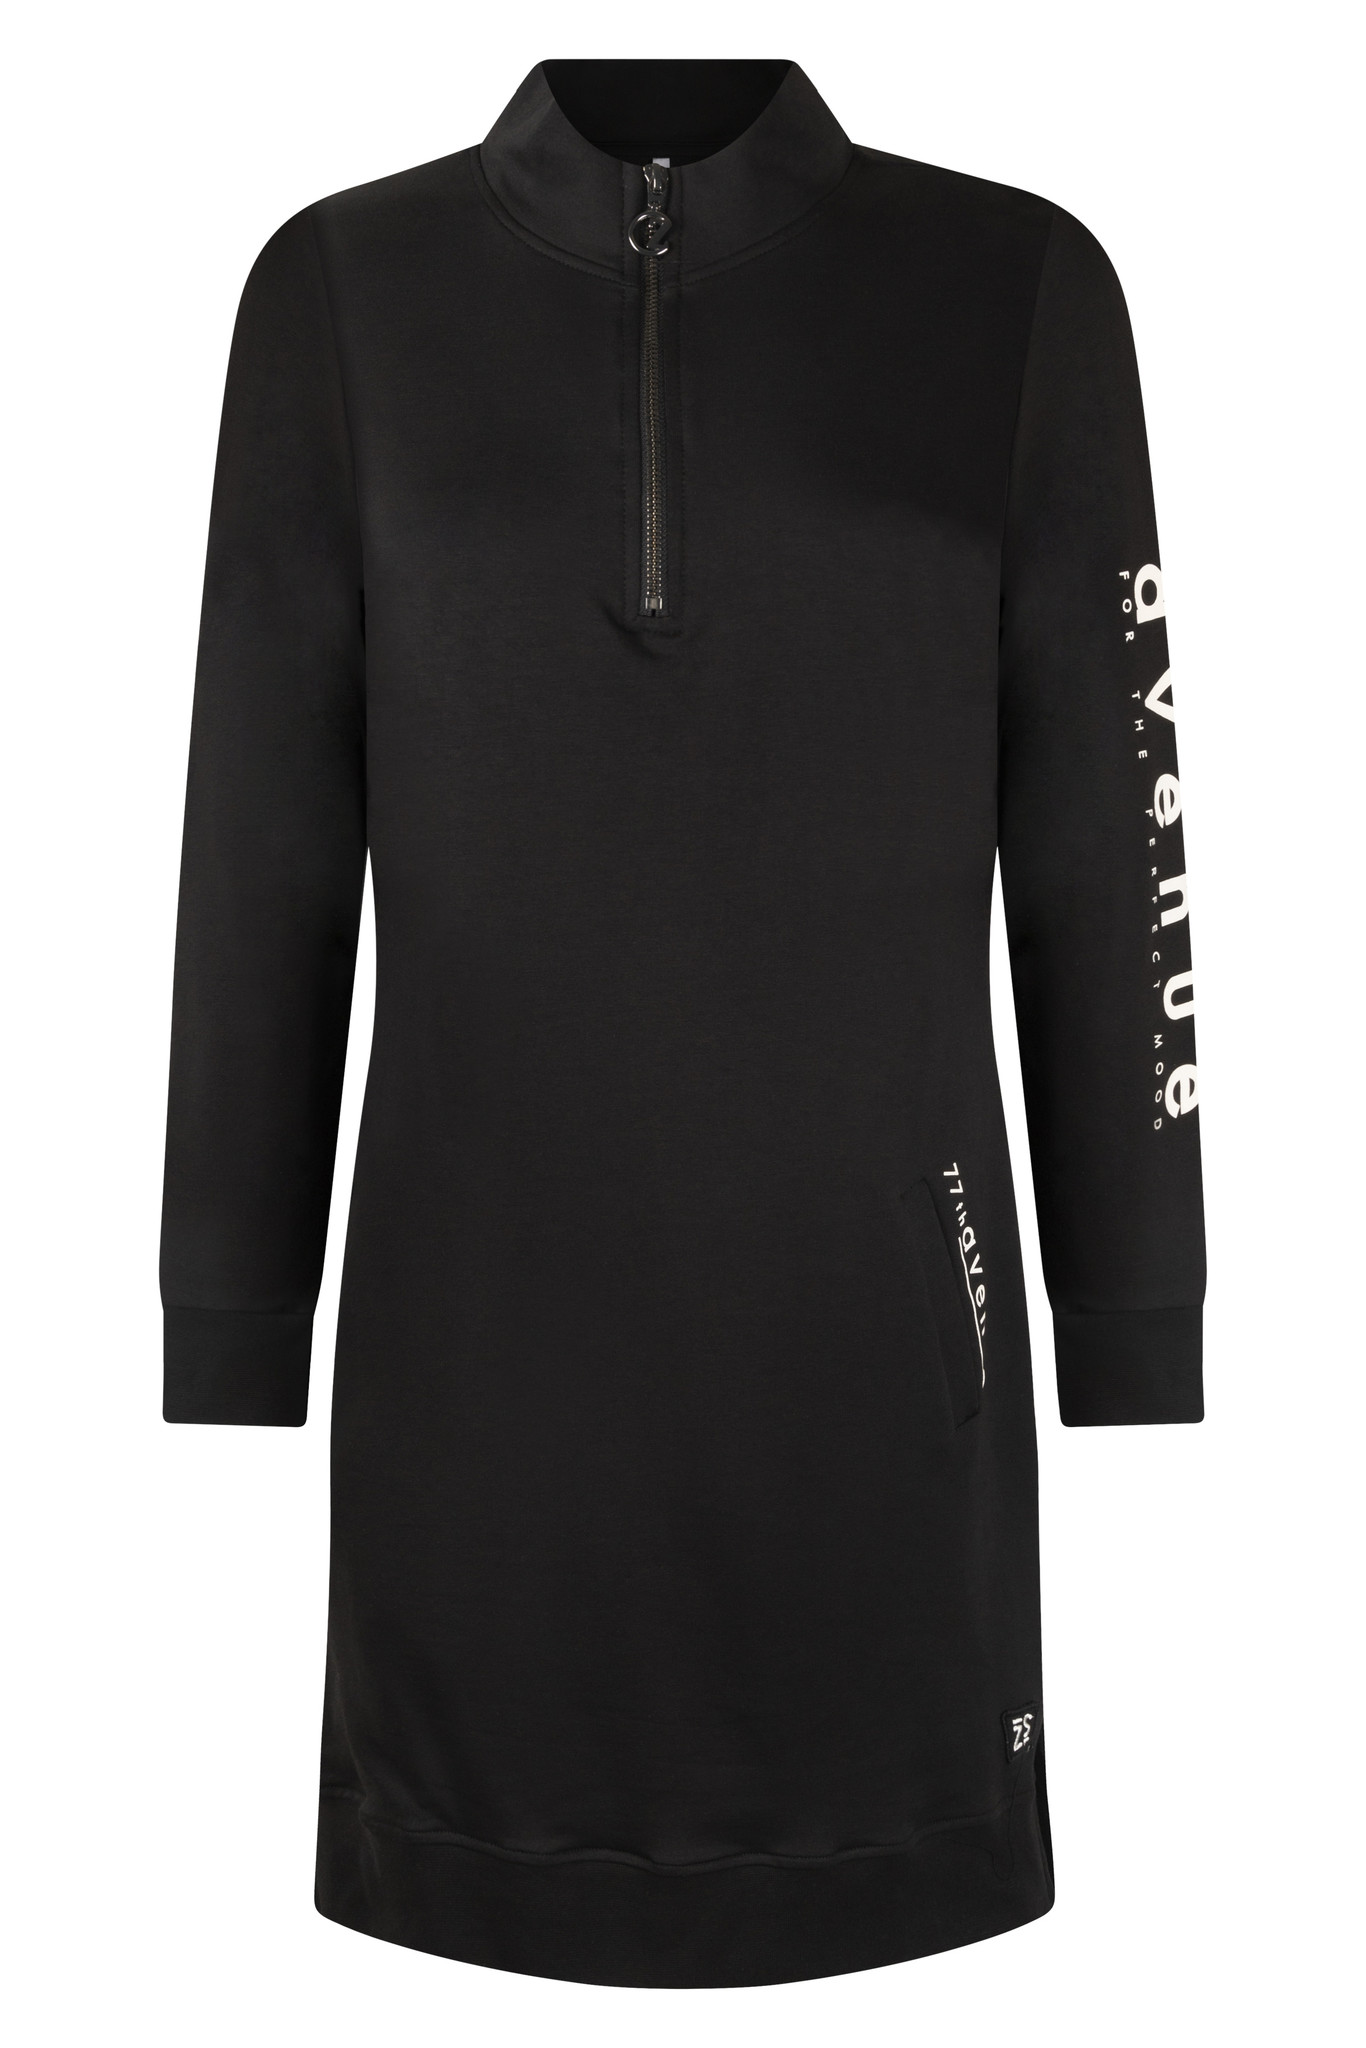 Zoso Zoso 215 Jaimy Sporty tunic/dress black/offwhite